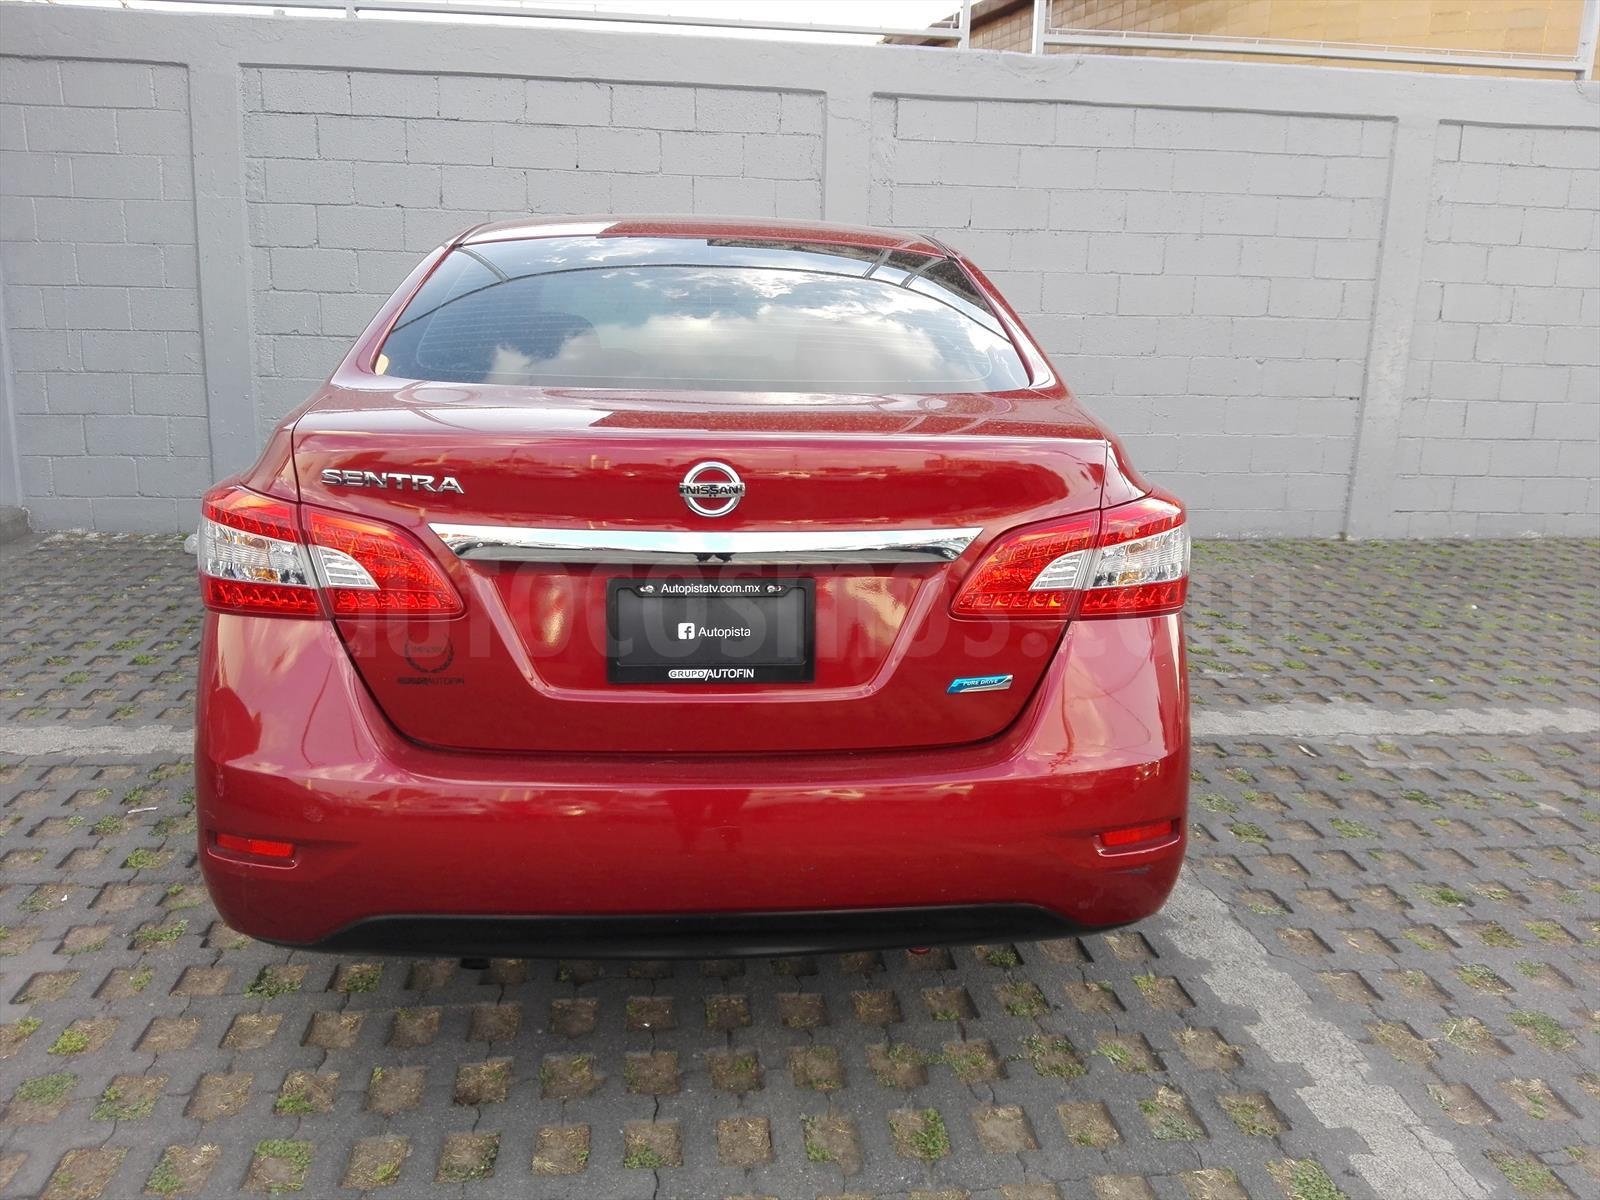 Venta Autos Usado Distrito Federal Nissan Sentra